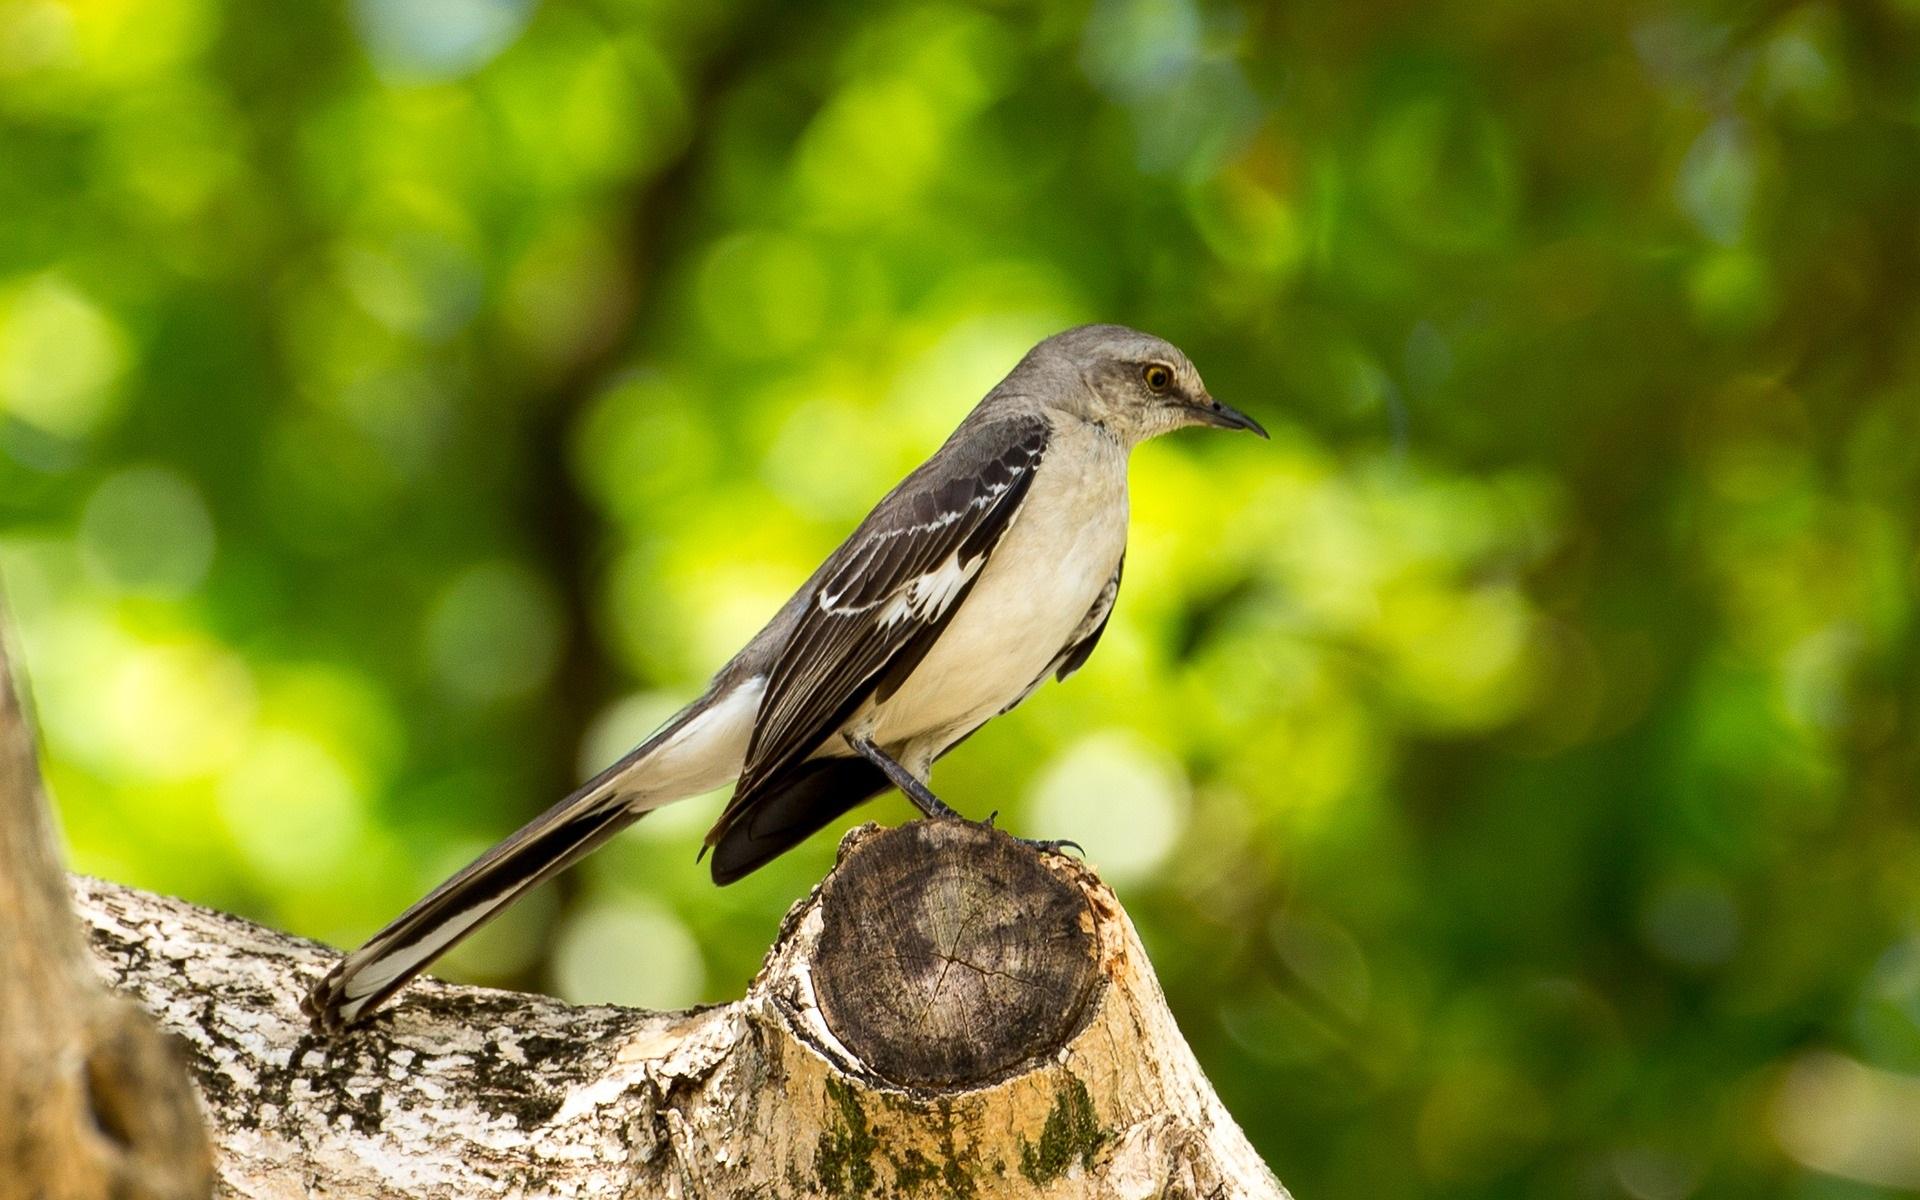 Mockingbird - Image by Rick (dirtdiver38) from Pixabay.jpg